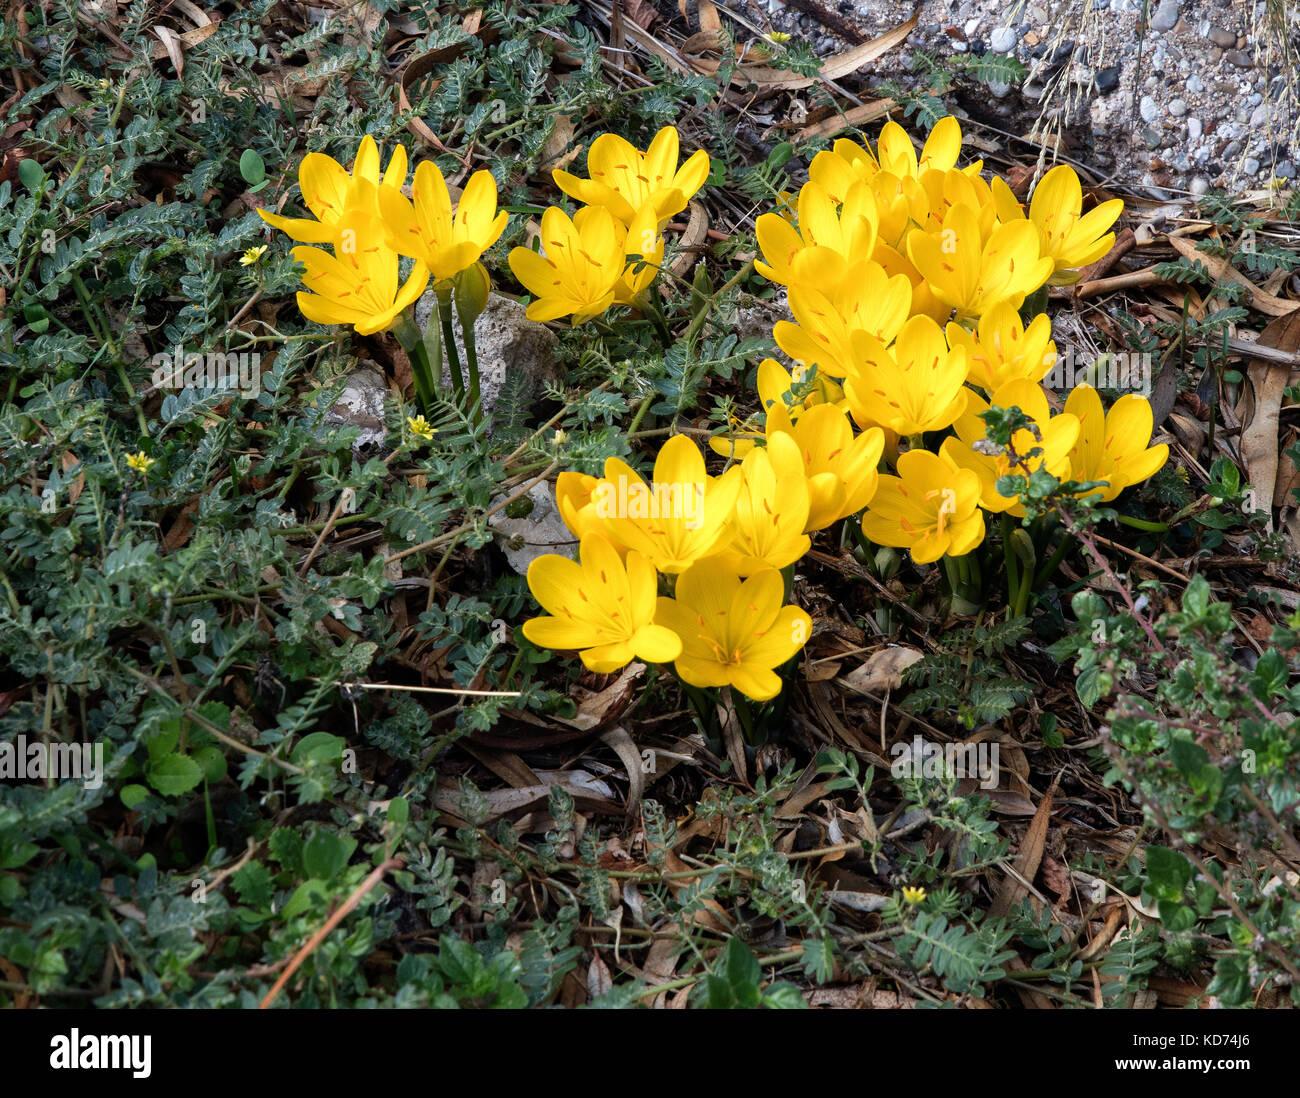 Yellow autumn crocus ( ? Sternbergia lutea ) emerging amongst roadside vegetation in a village on the island of - Stock Image